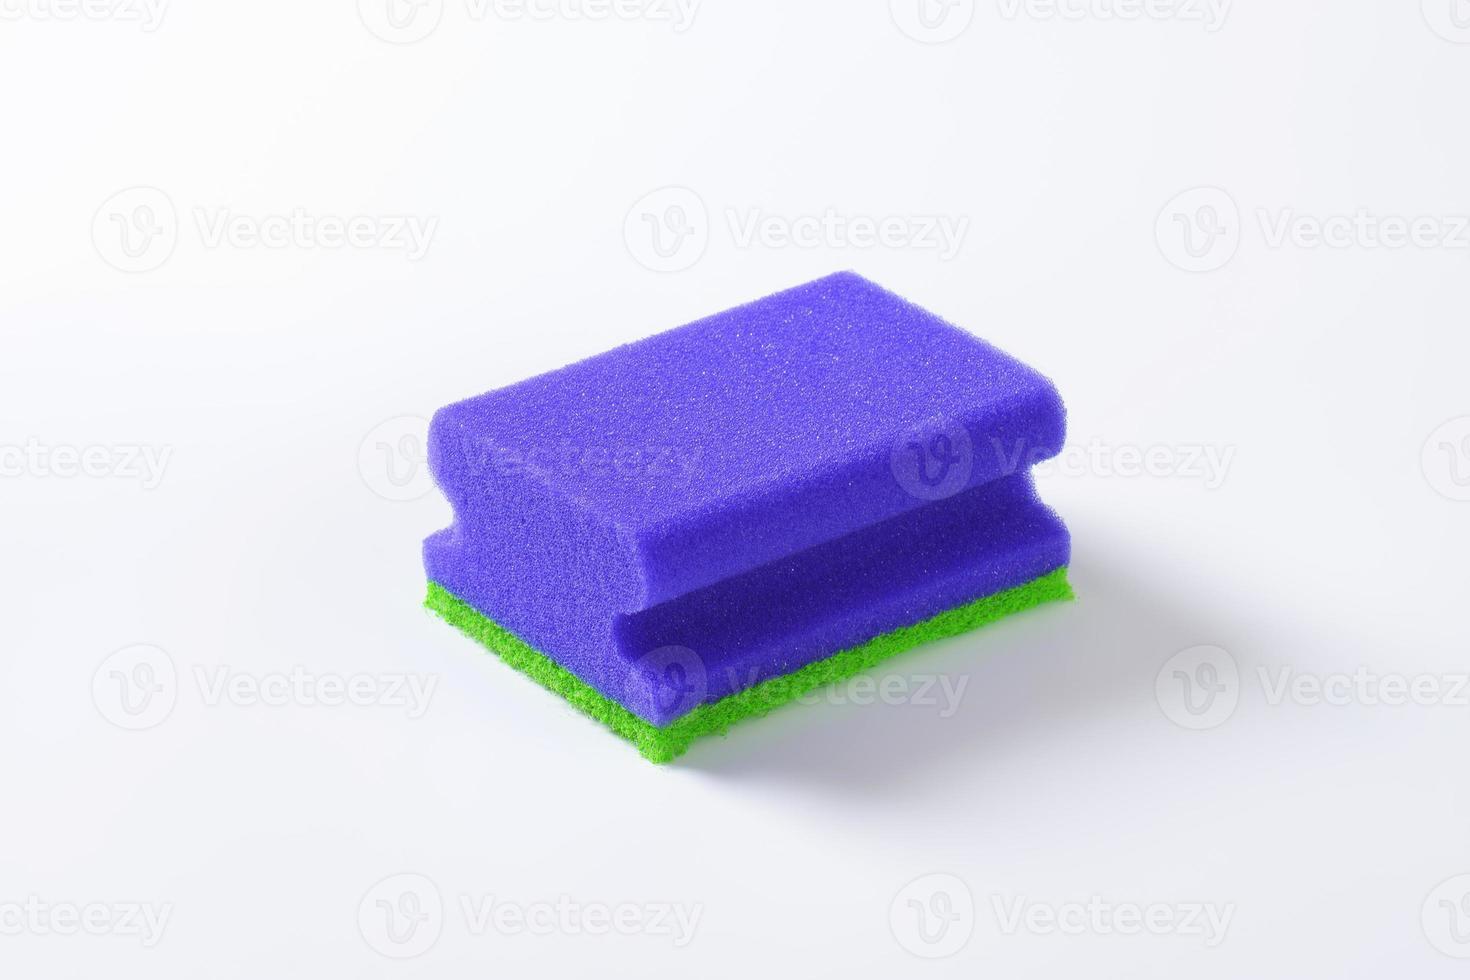 blauwe keukenspons foto